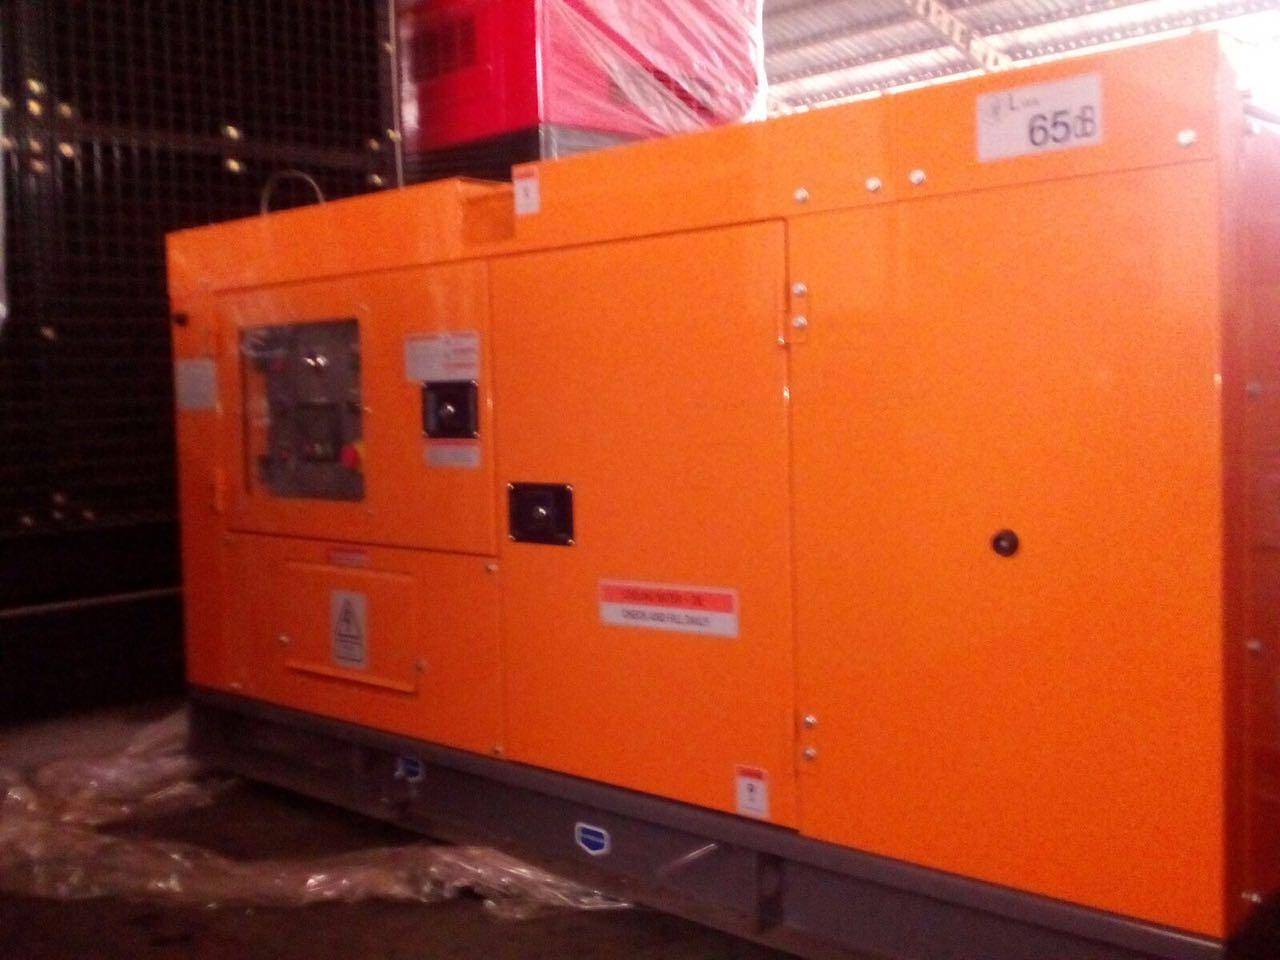 Article Akuisisi Caterpillar Inc. atas Perkins Diesel Engine Company Limited<br><br> genset perkins 1103a 33tg1 generator stamford 45 kva silent type